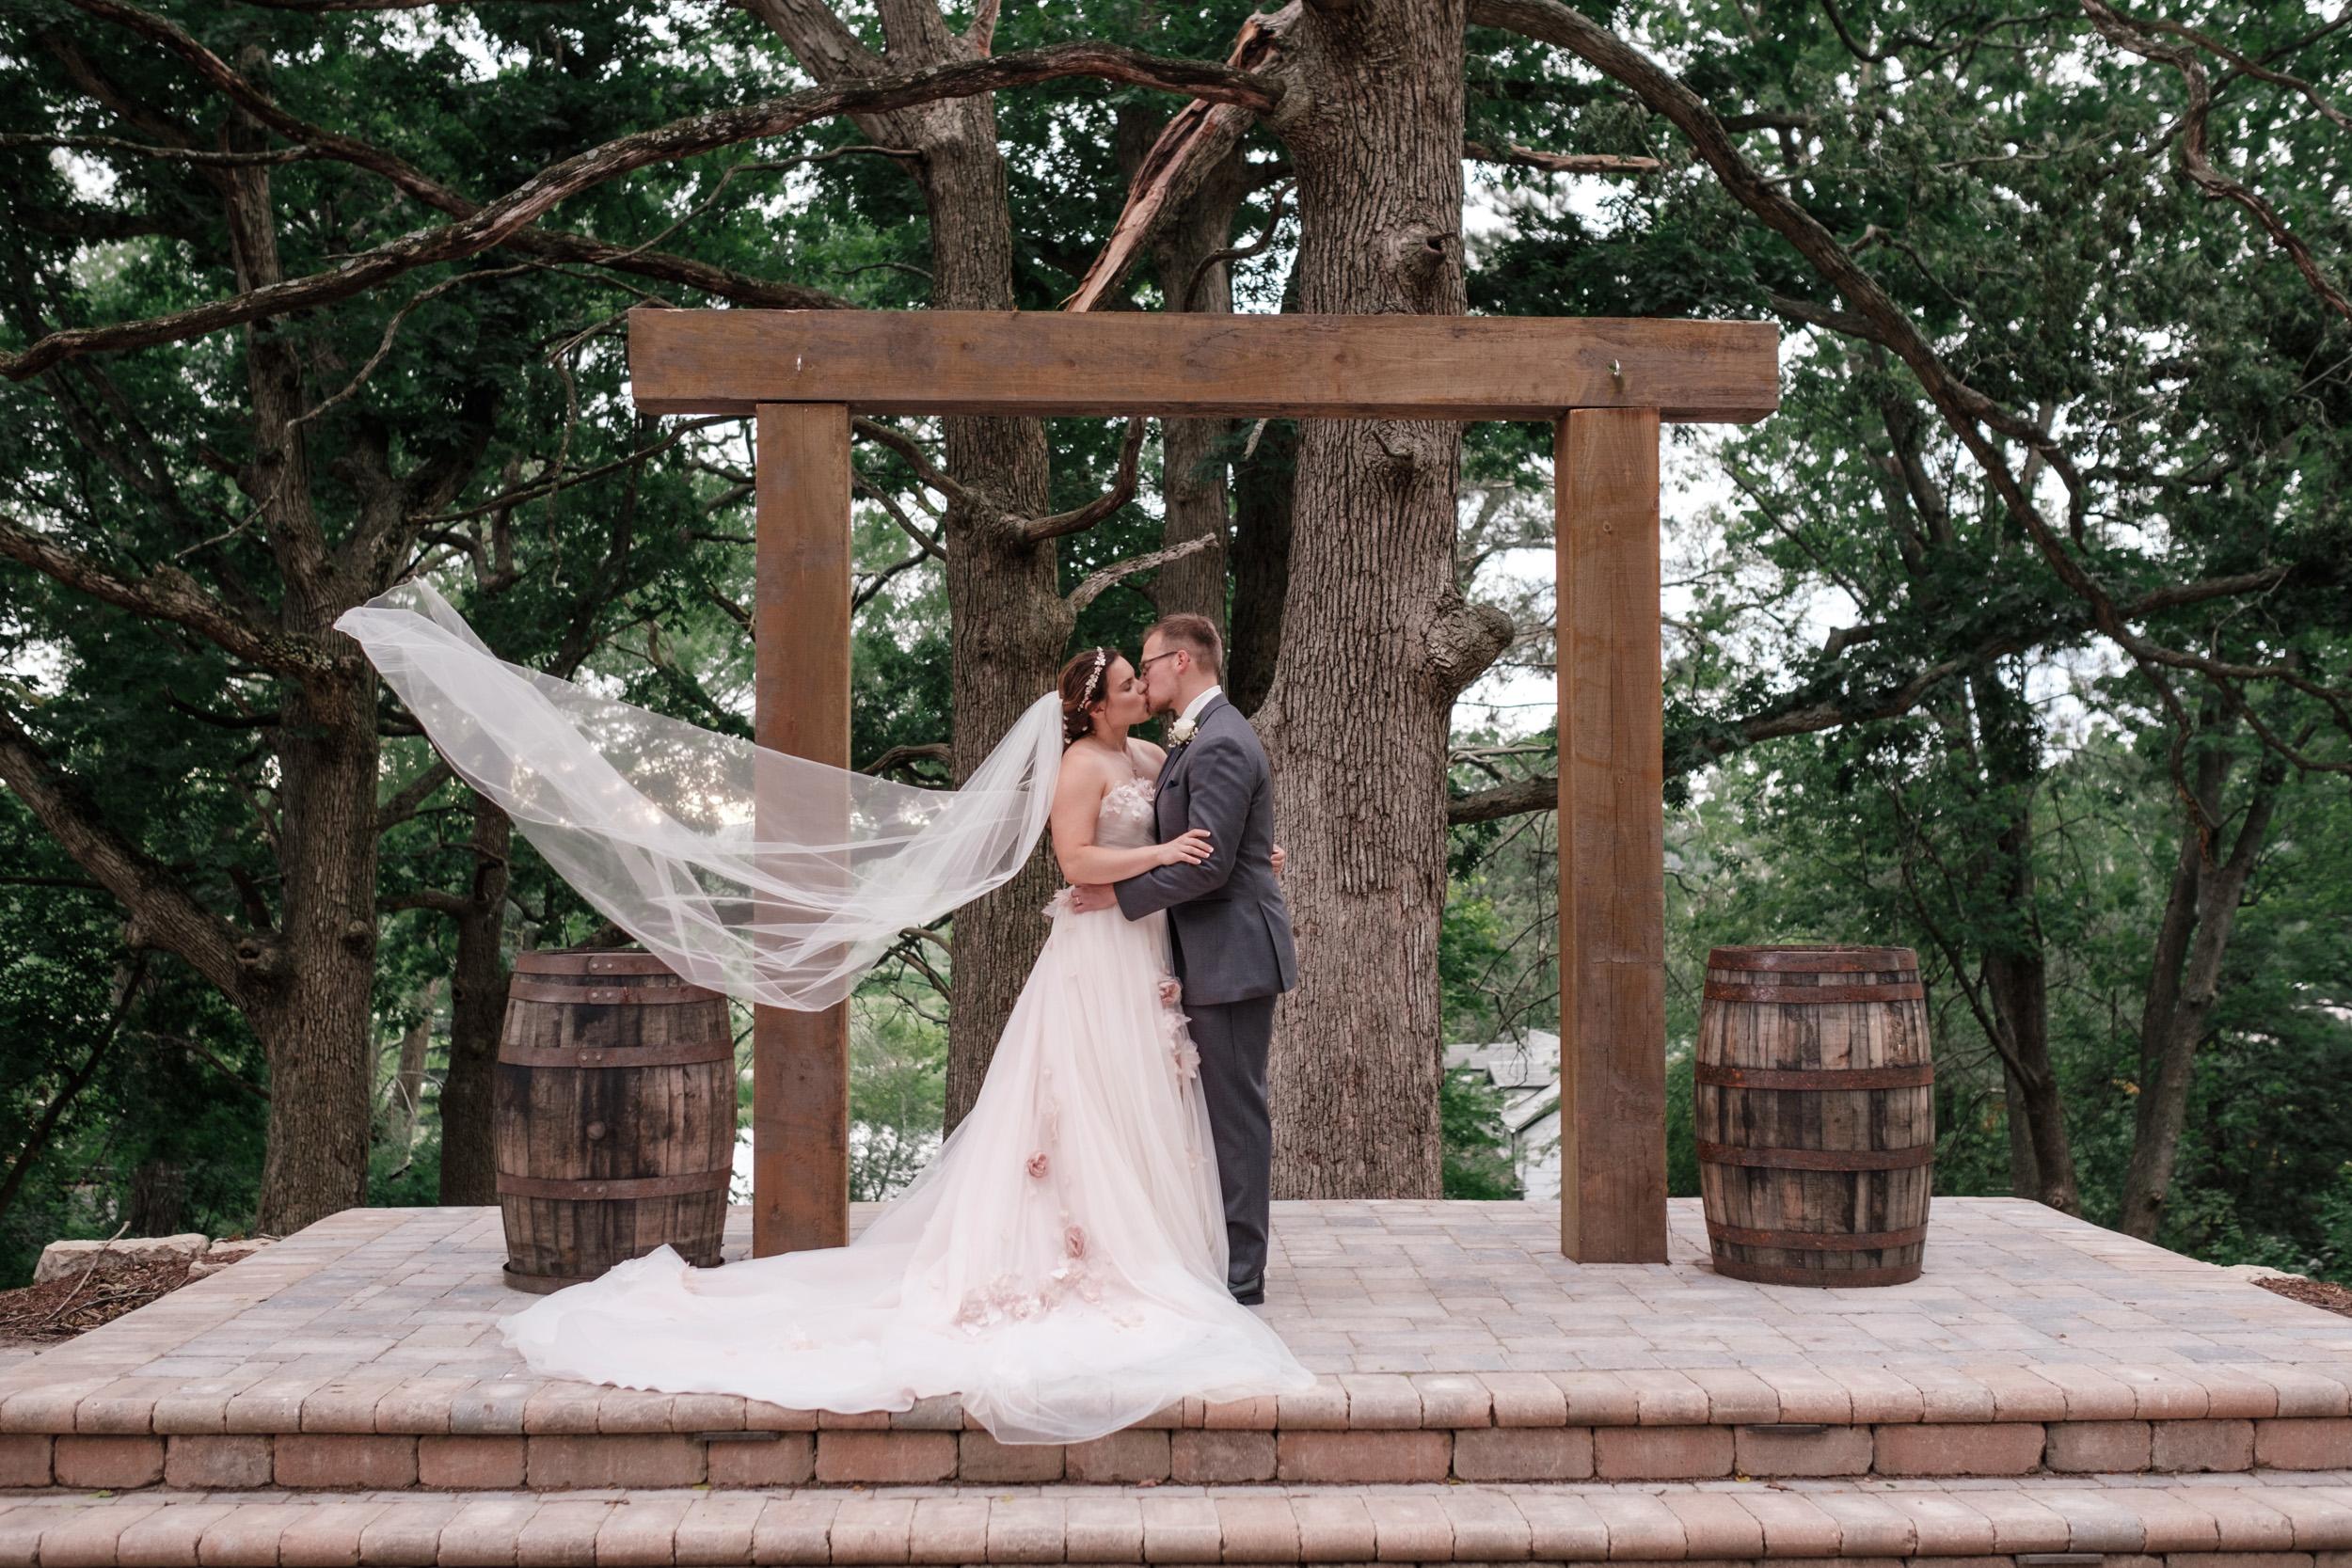 19-06-22-Ryan-Katie-The-Fields-Reserve-Wedding-39.jpg